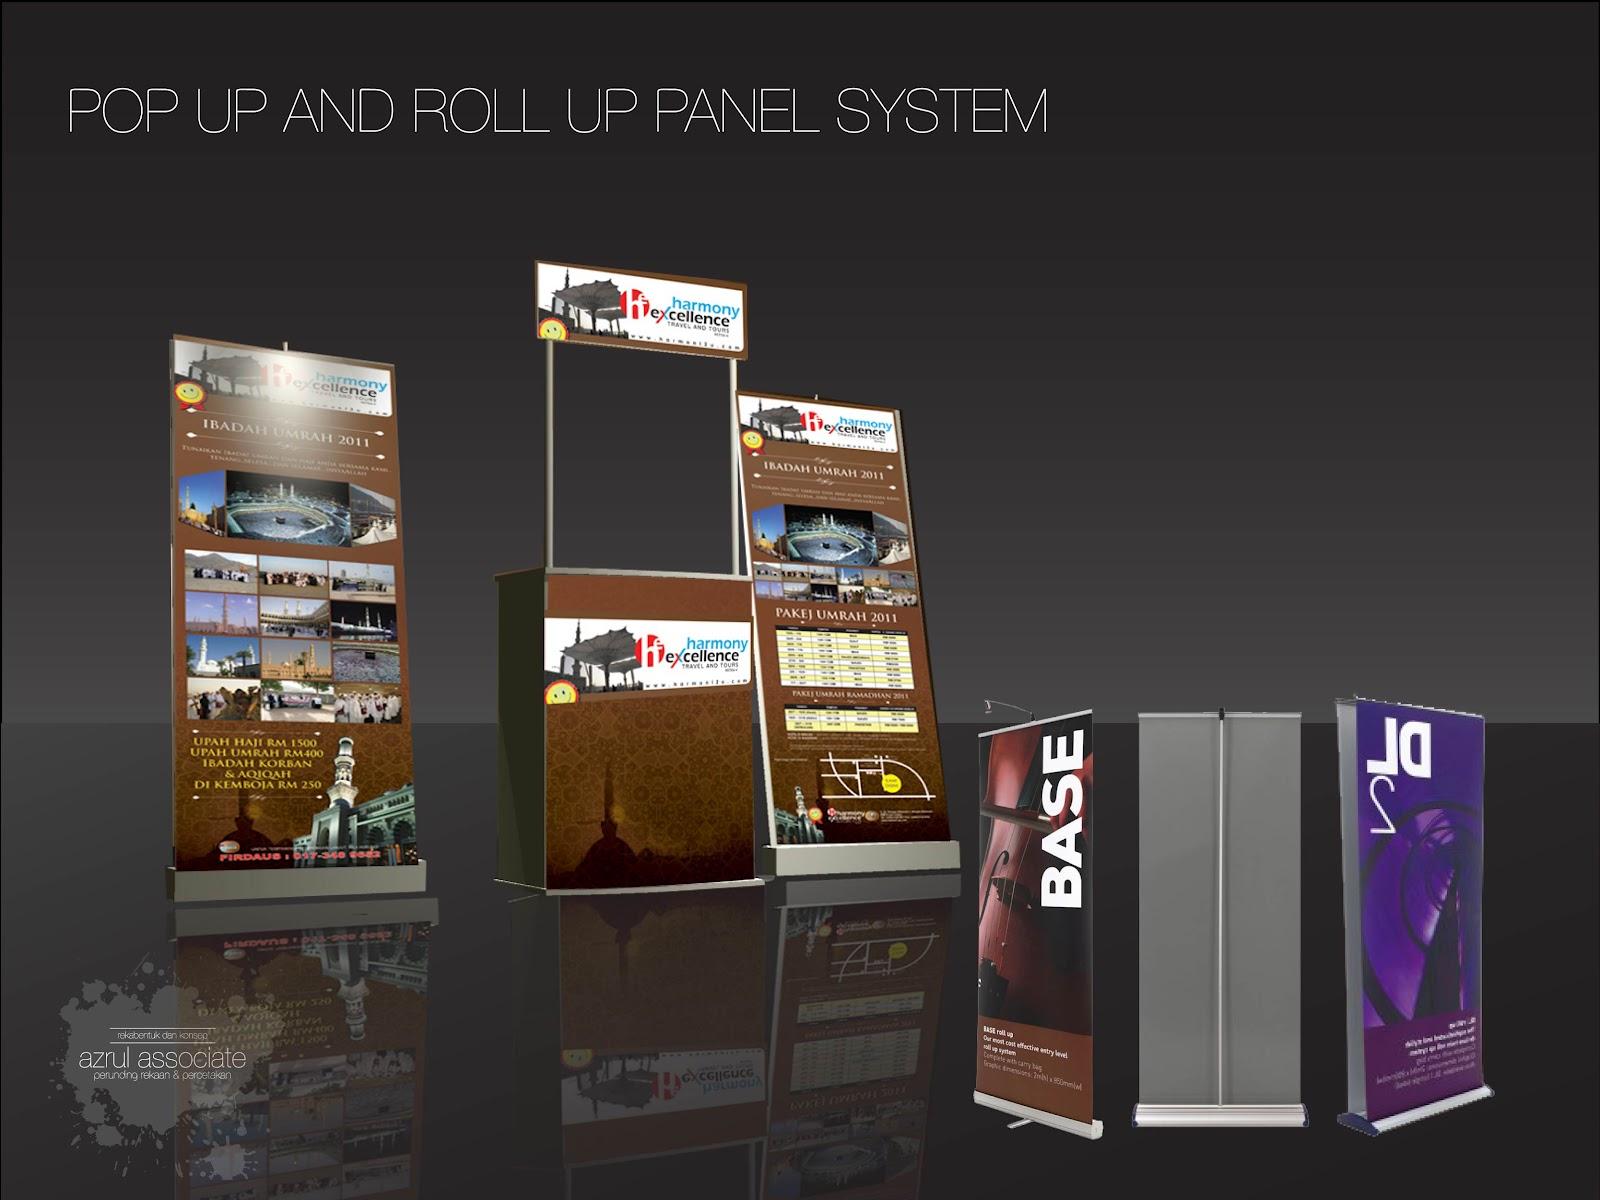 coolkad by azrul associates pop up and roll up panel system pameran produk dan perkhidmatan. Black Bedroom Furniture Sets. Home Design Ideas